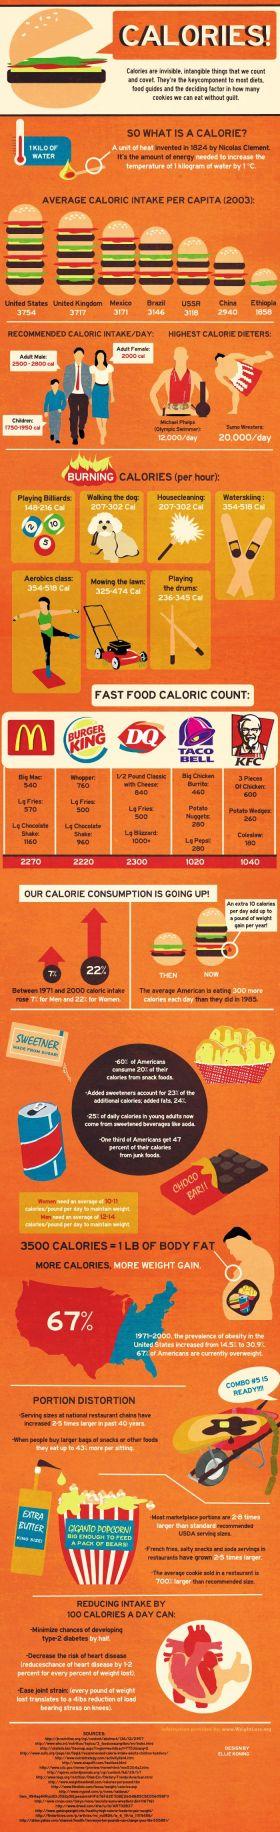 Calories info